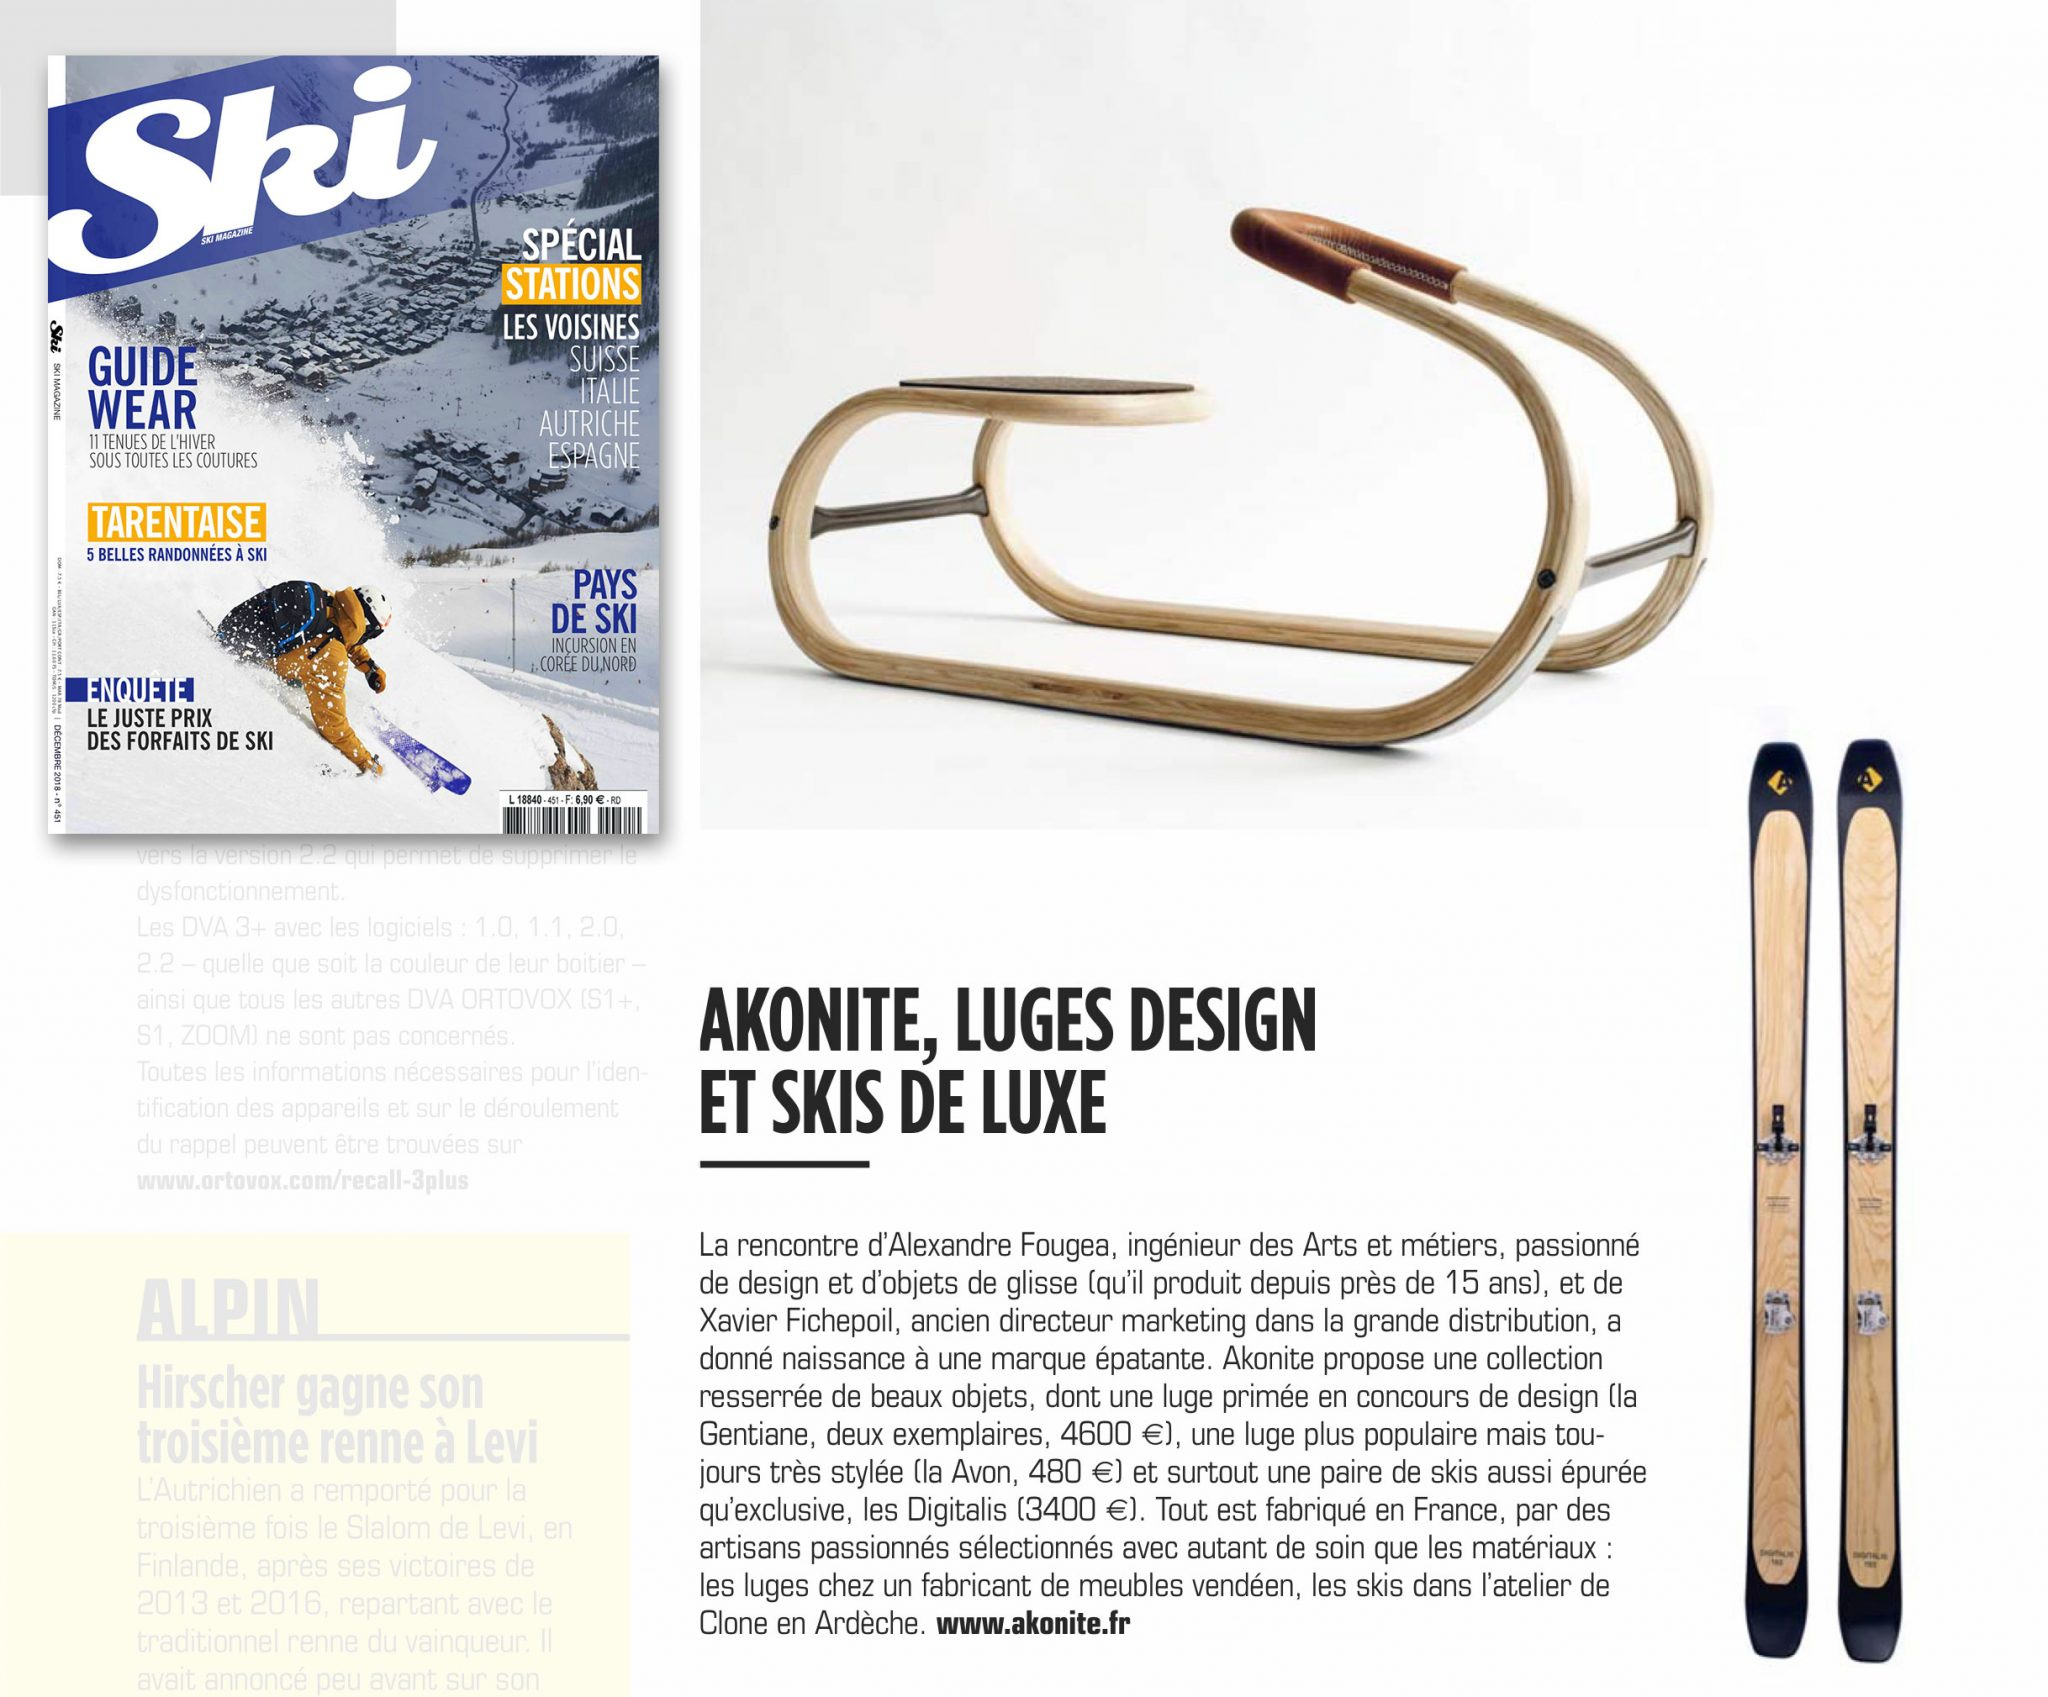 Clone Ind, des snowboards et des skis écolo et artistiques mag ski sept 2019 akonite clone